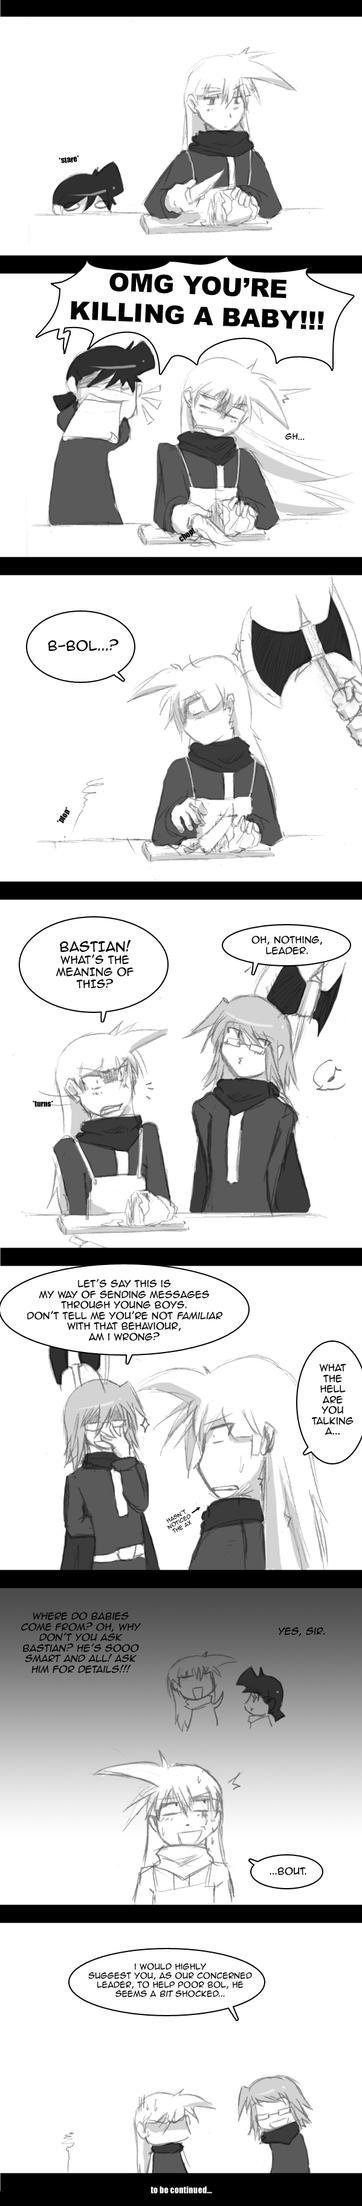 Normal day comic 02 - Backfire by KarinEXE